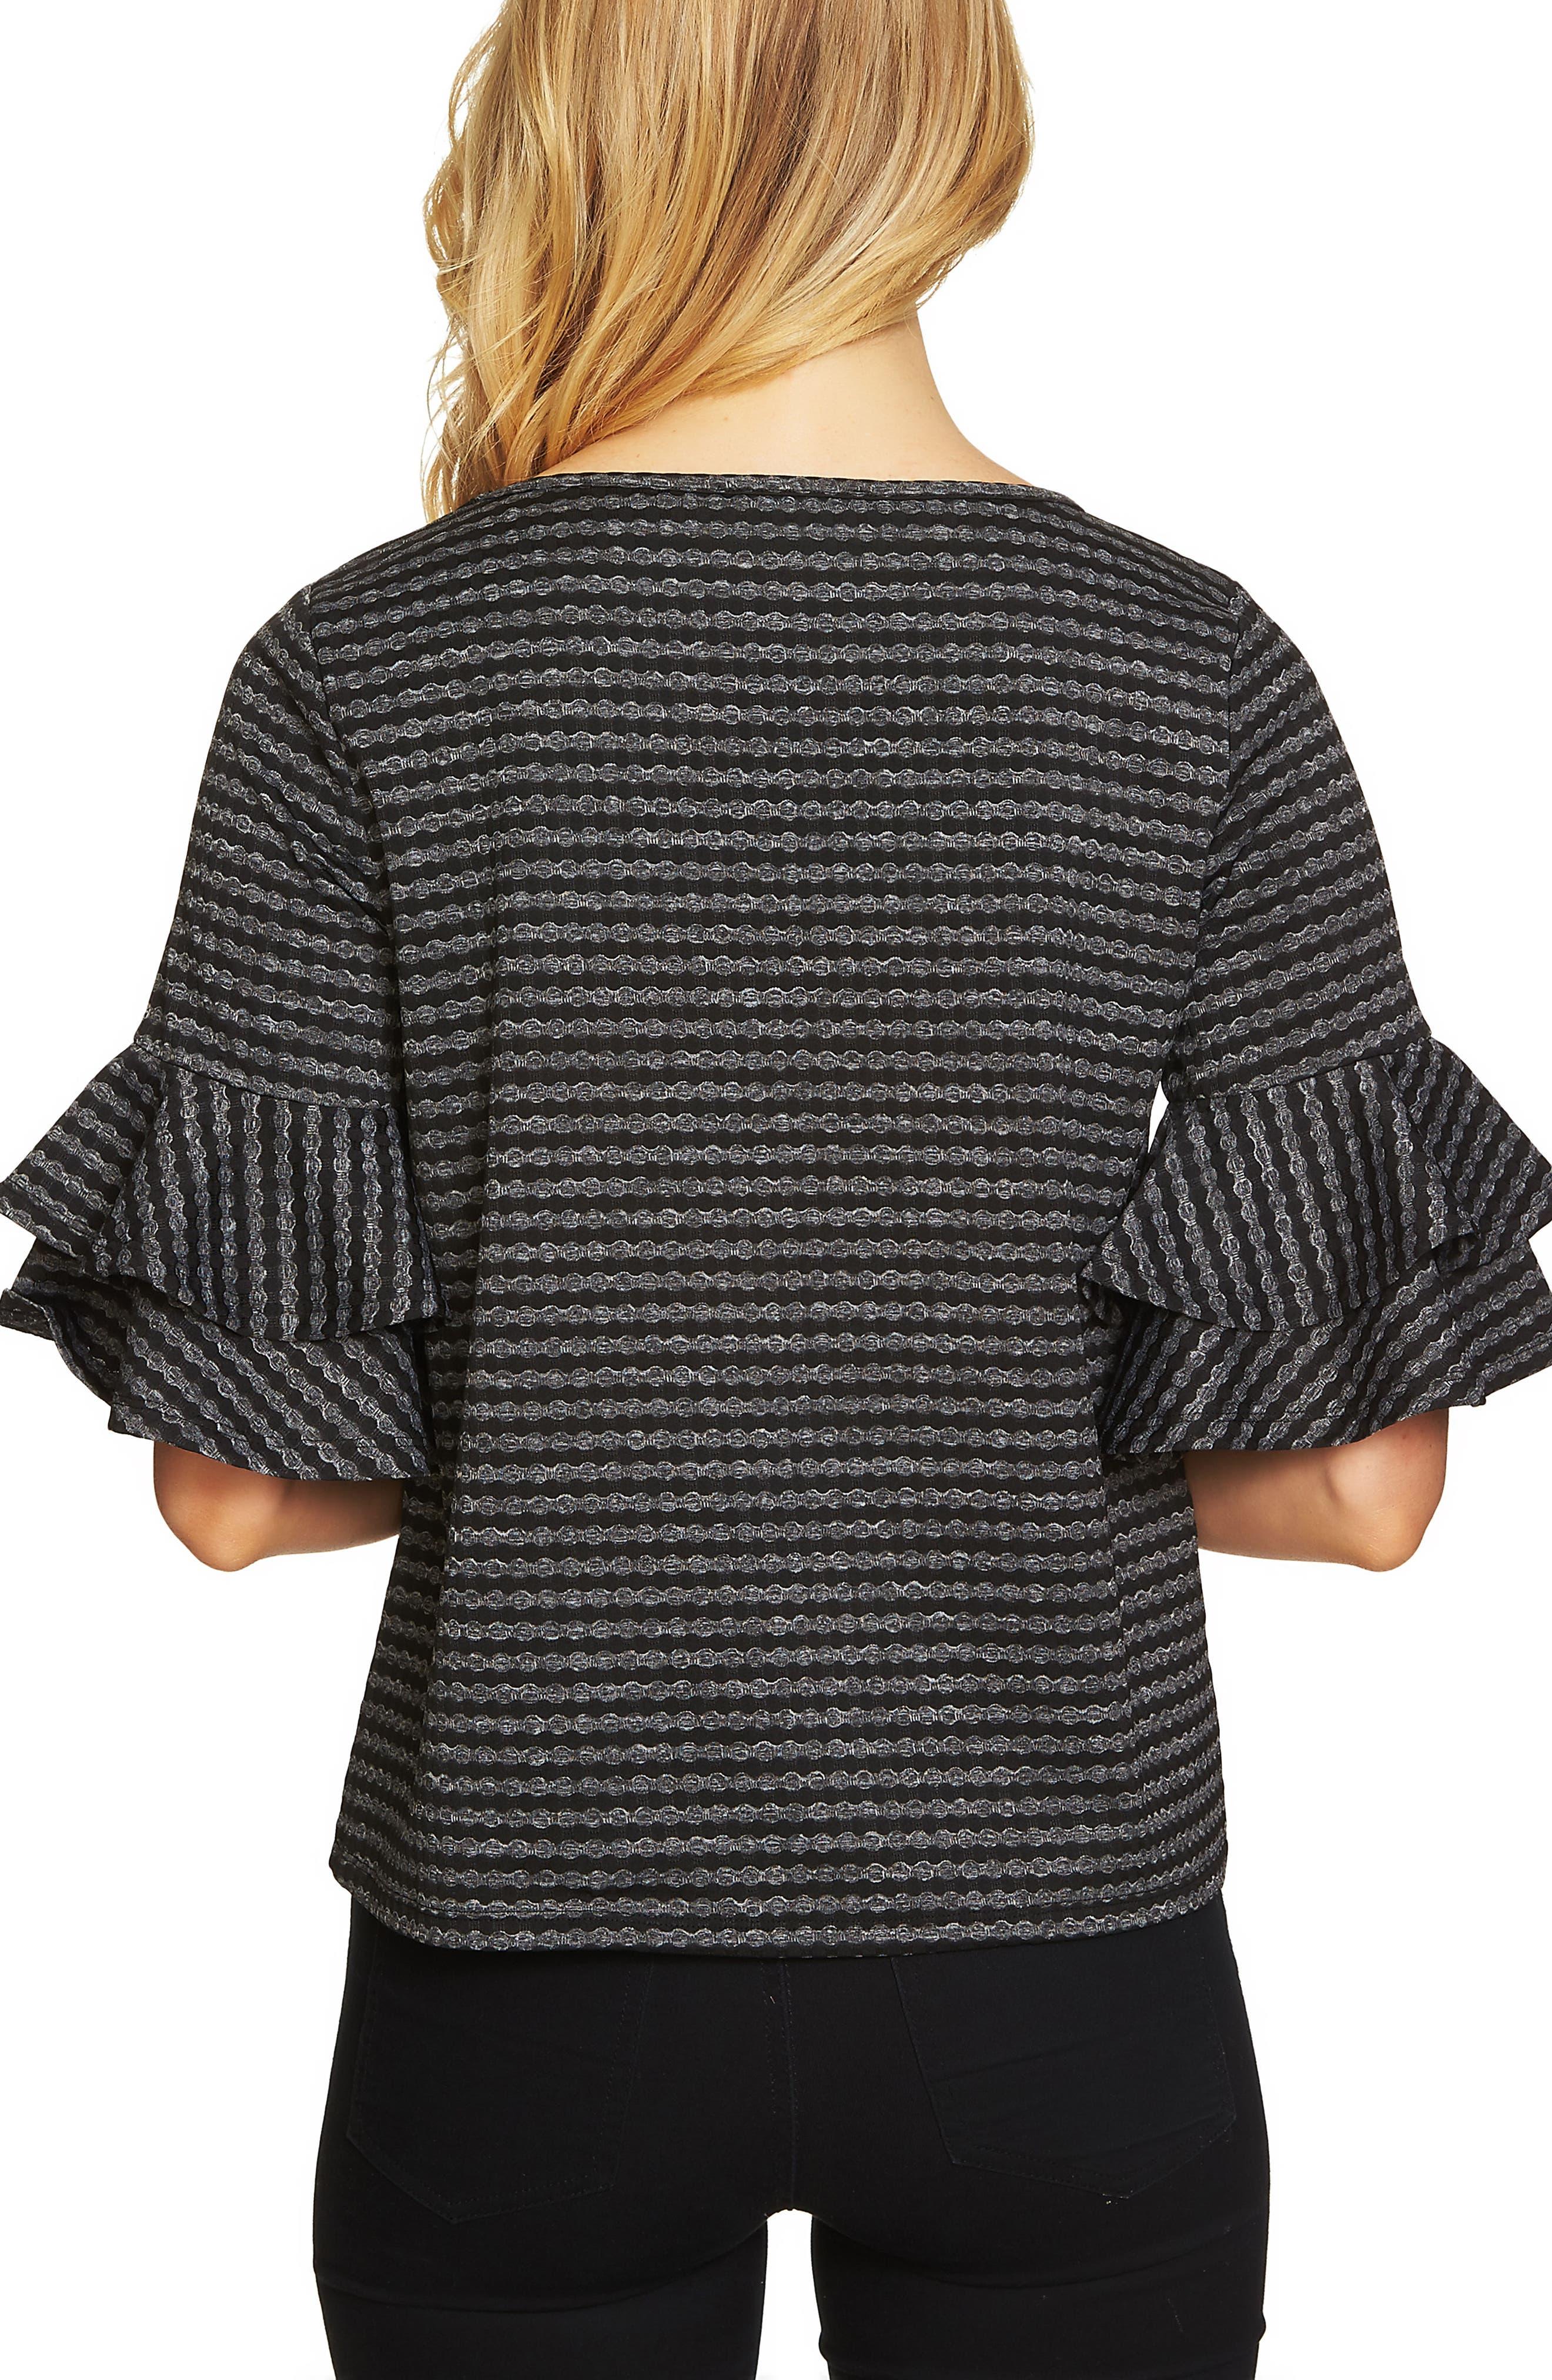 Ruffle Sleeve Knit Top,                             Alternate thumbnail 3, color,